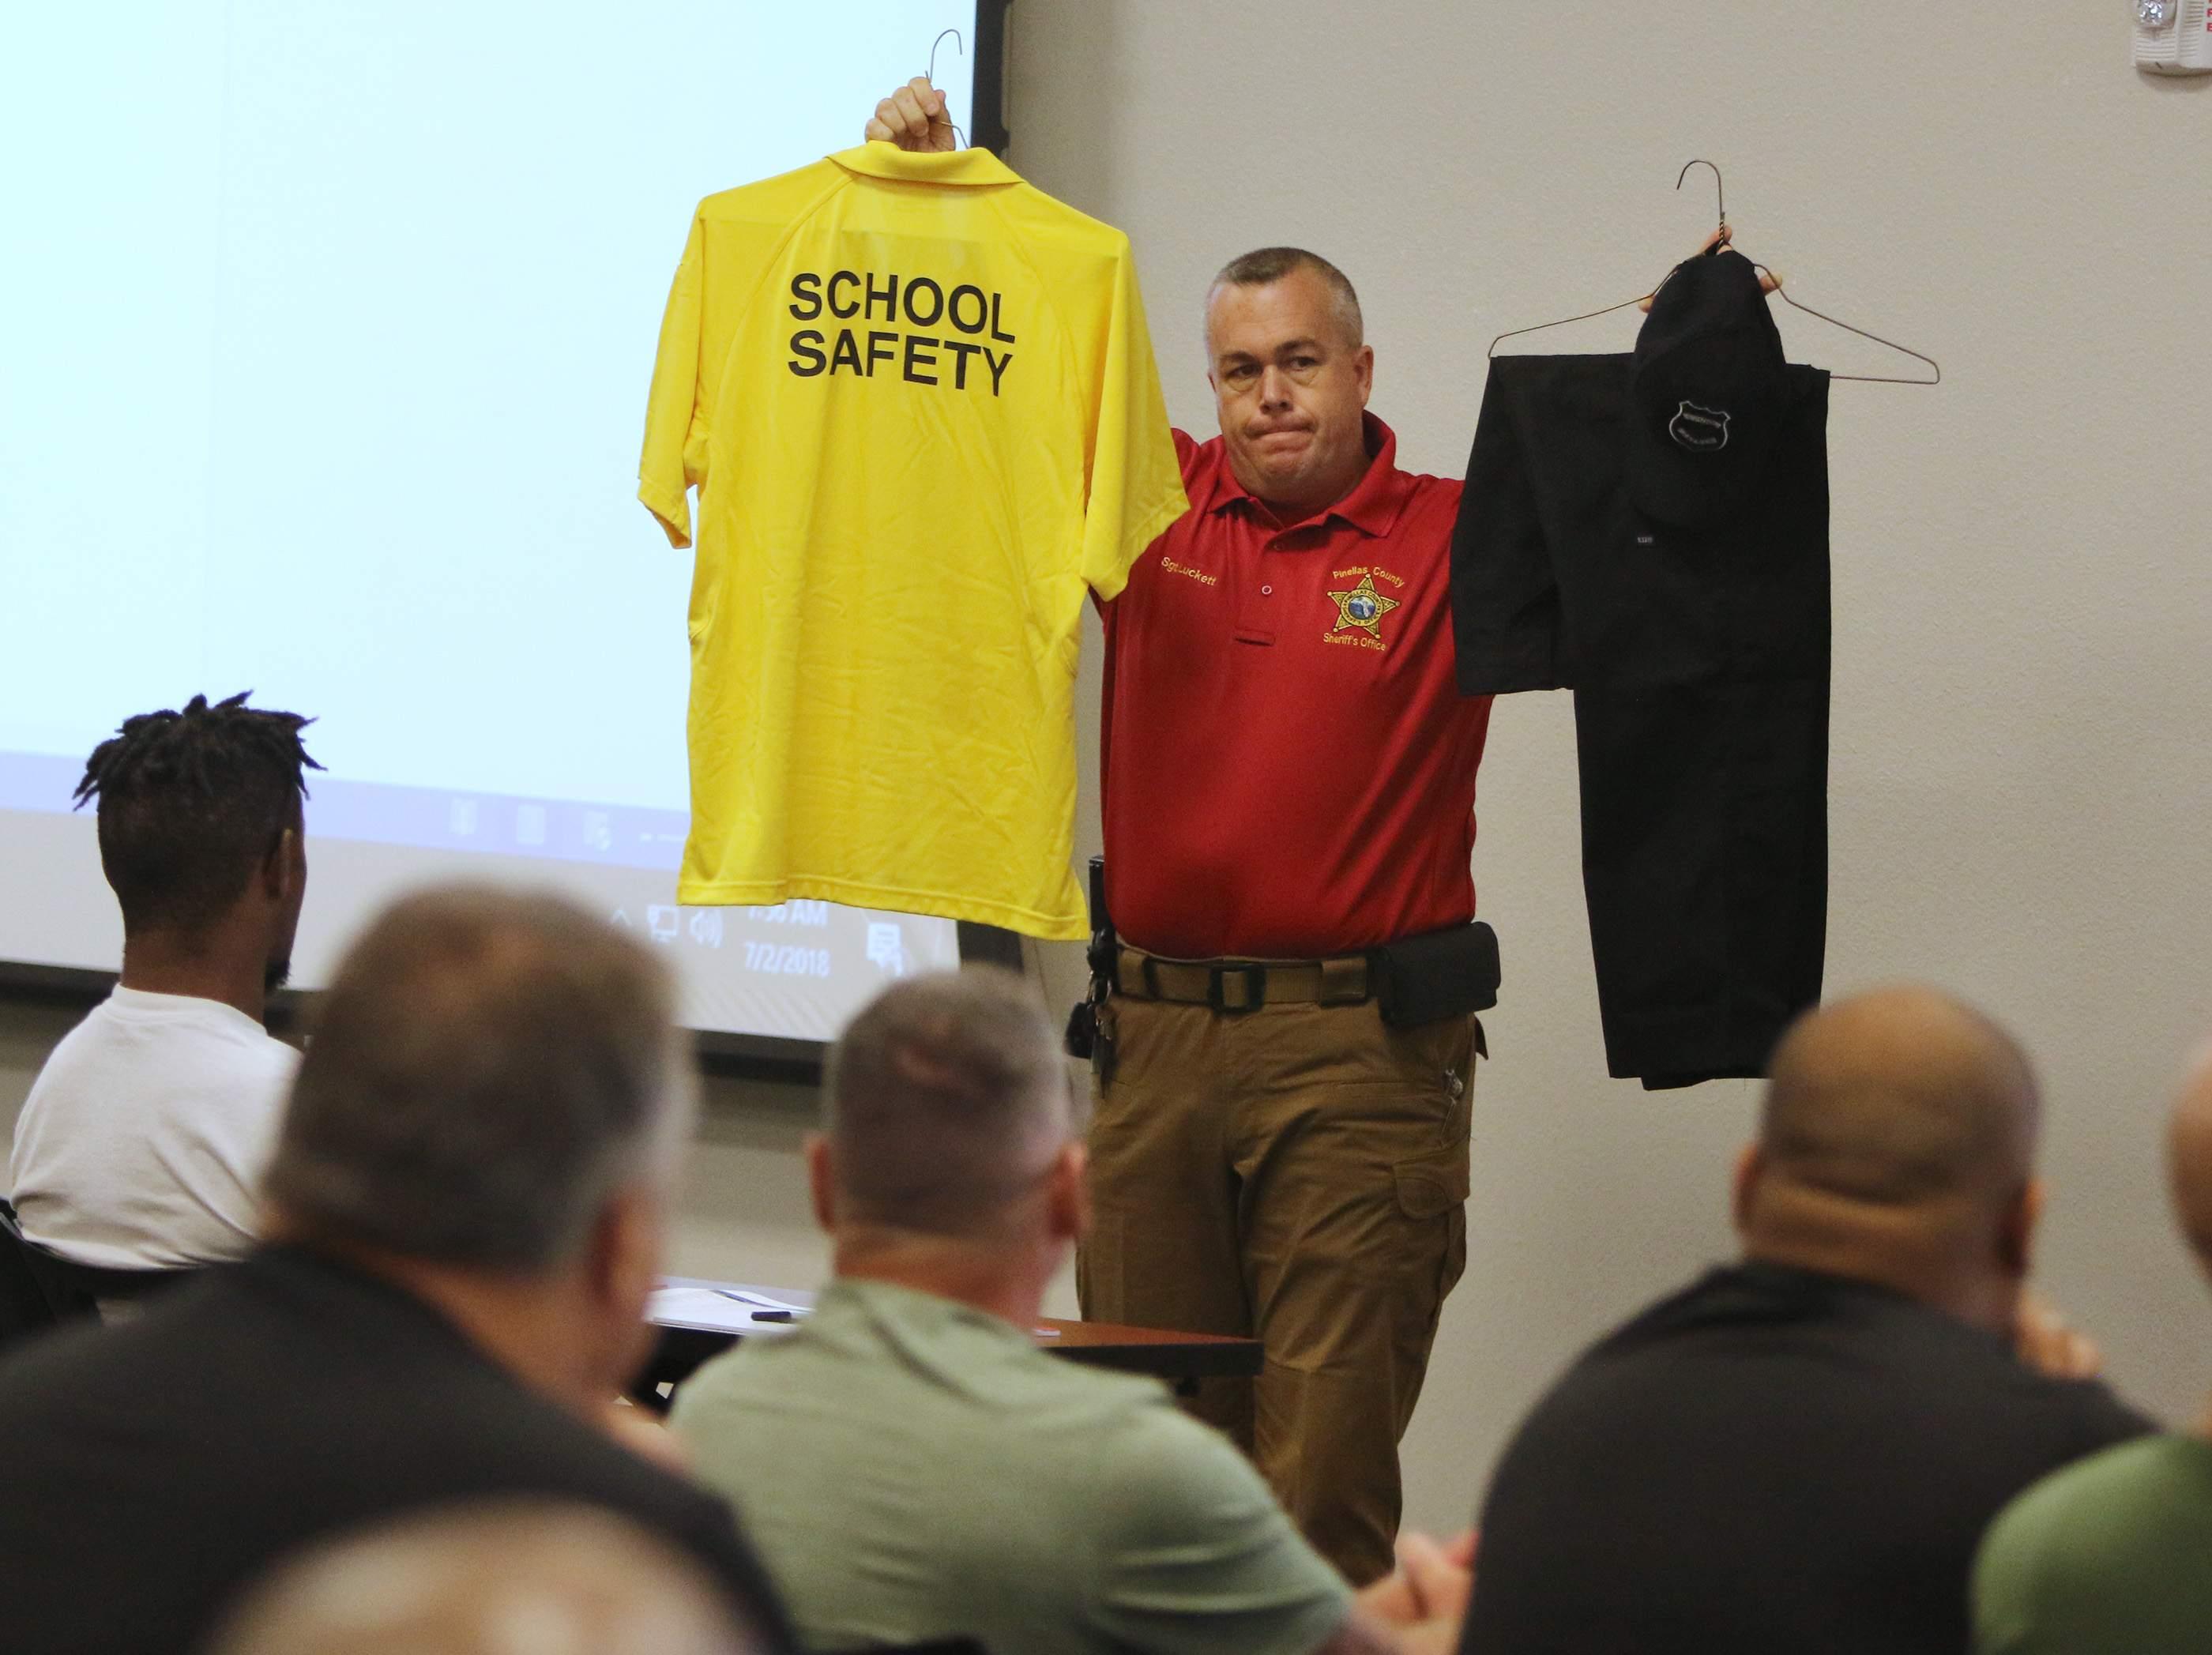 Florida's sobering new focus on school security creates a